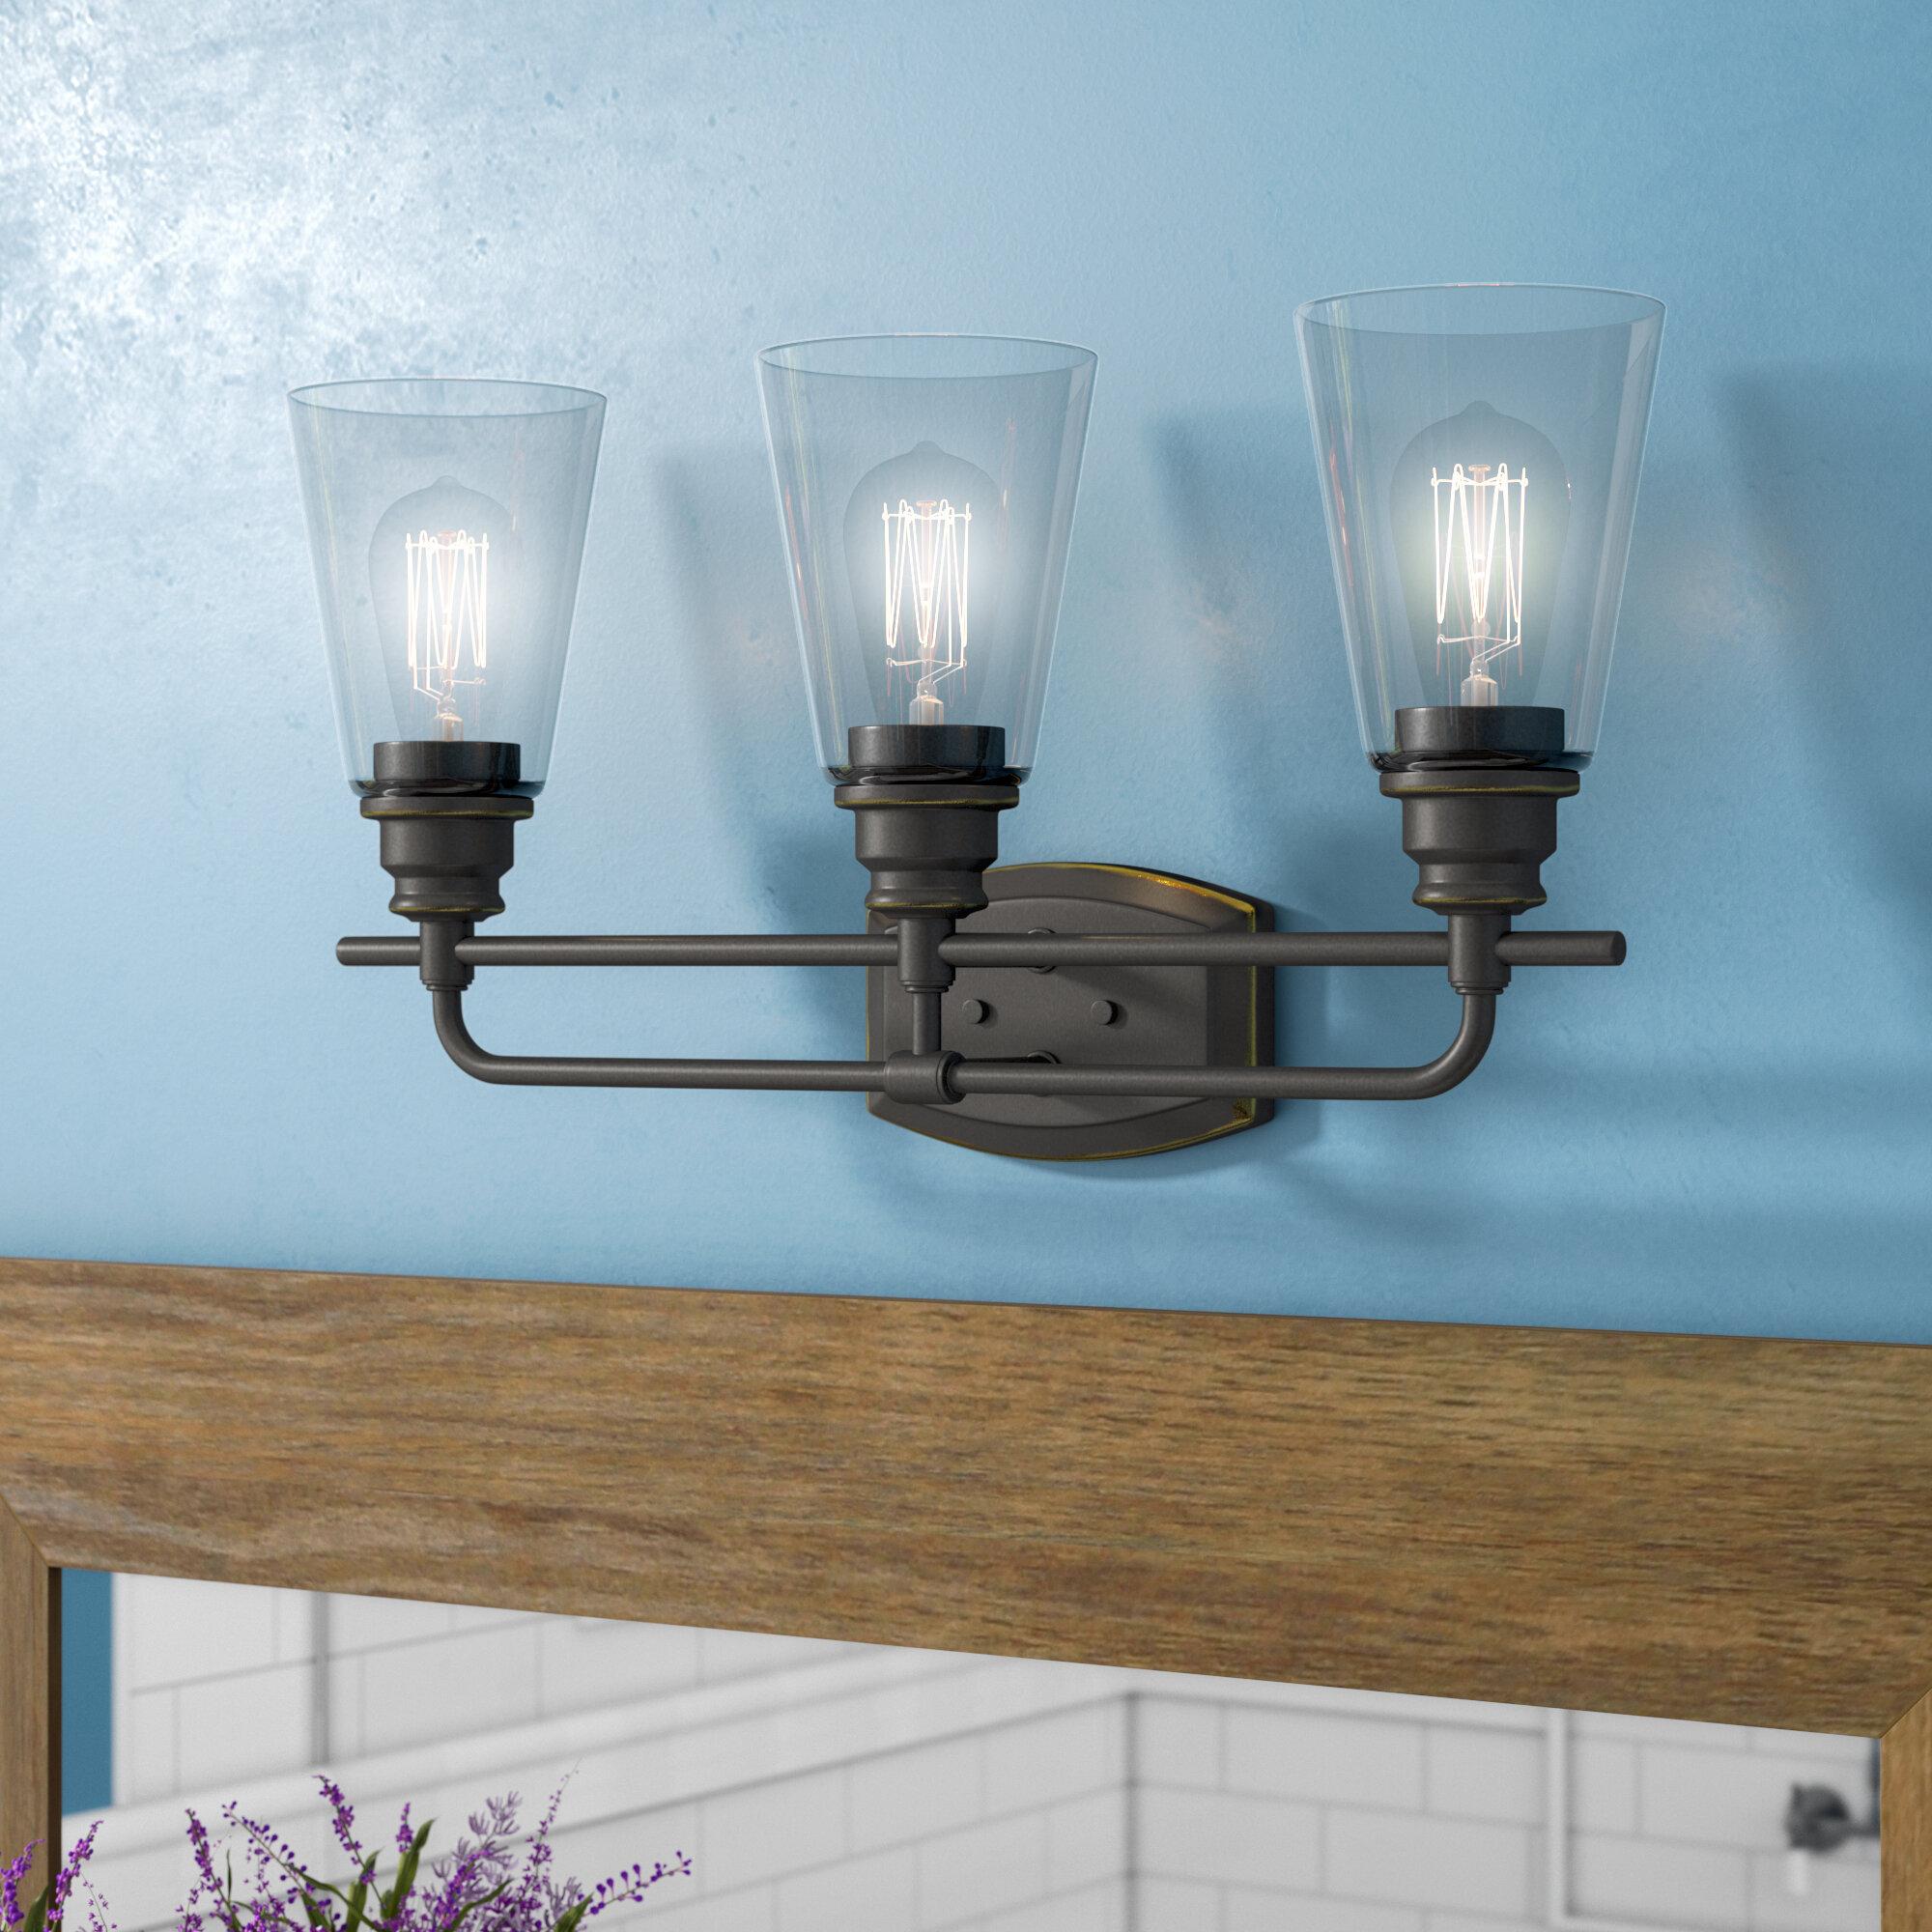 Outstanding 3 Light Vanity Light Pictures - Bathtub Ideas - dilata.info